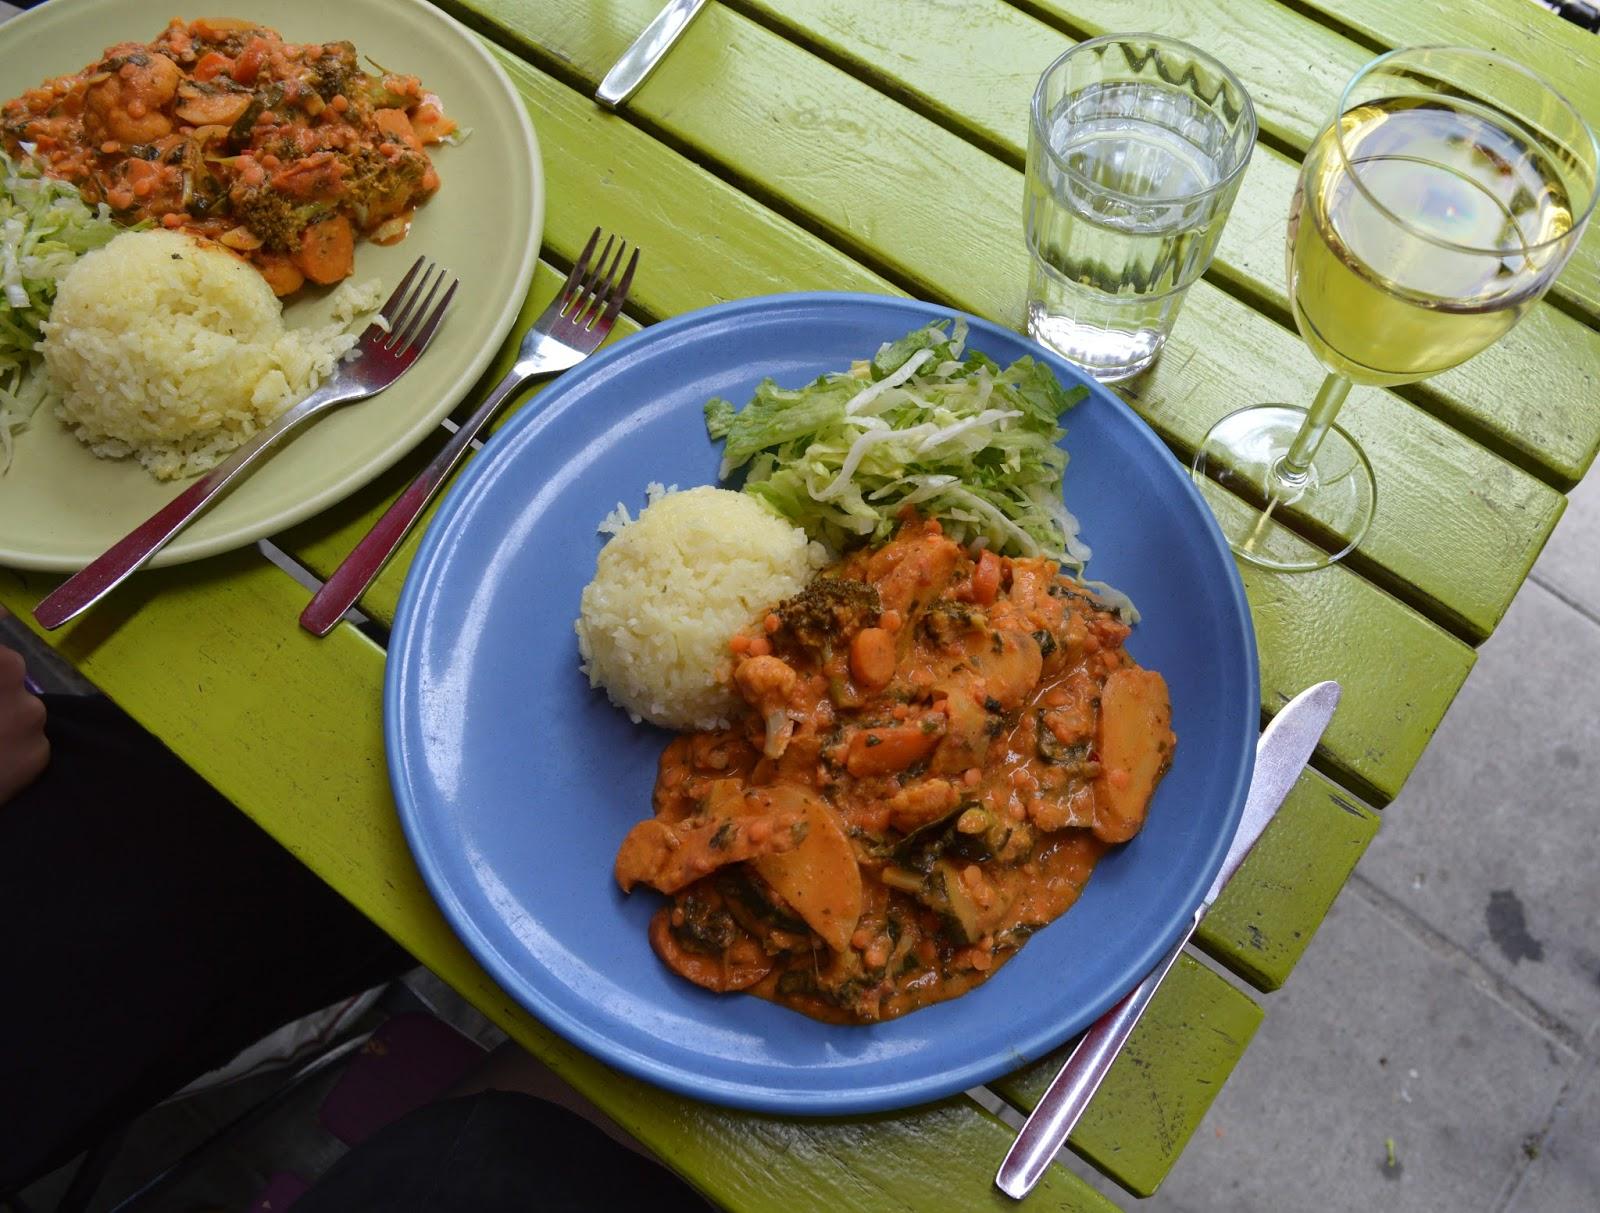 Vegetarian curry at vegetarian restaurant Chutney in Stockholm